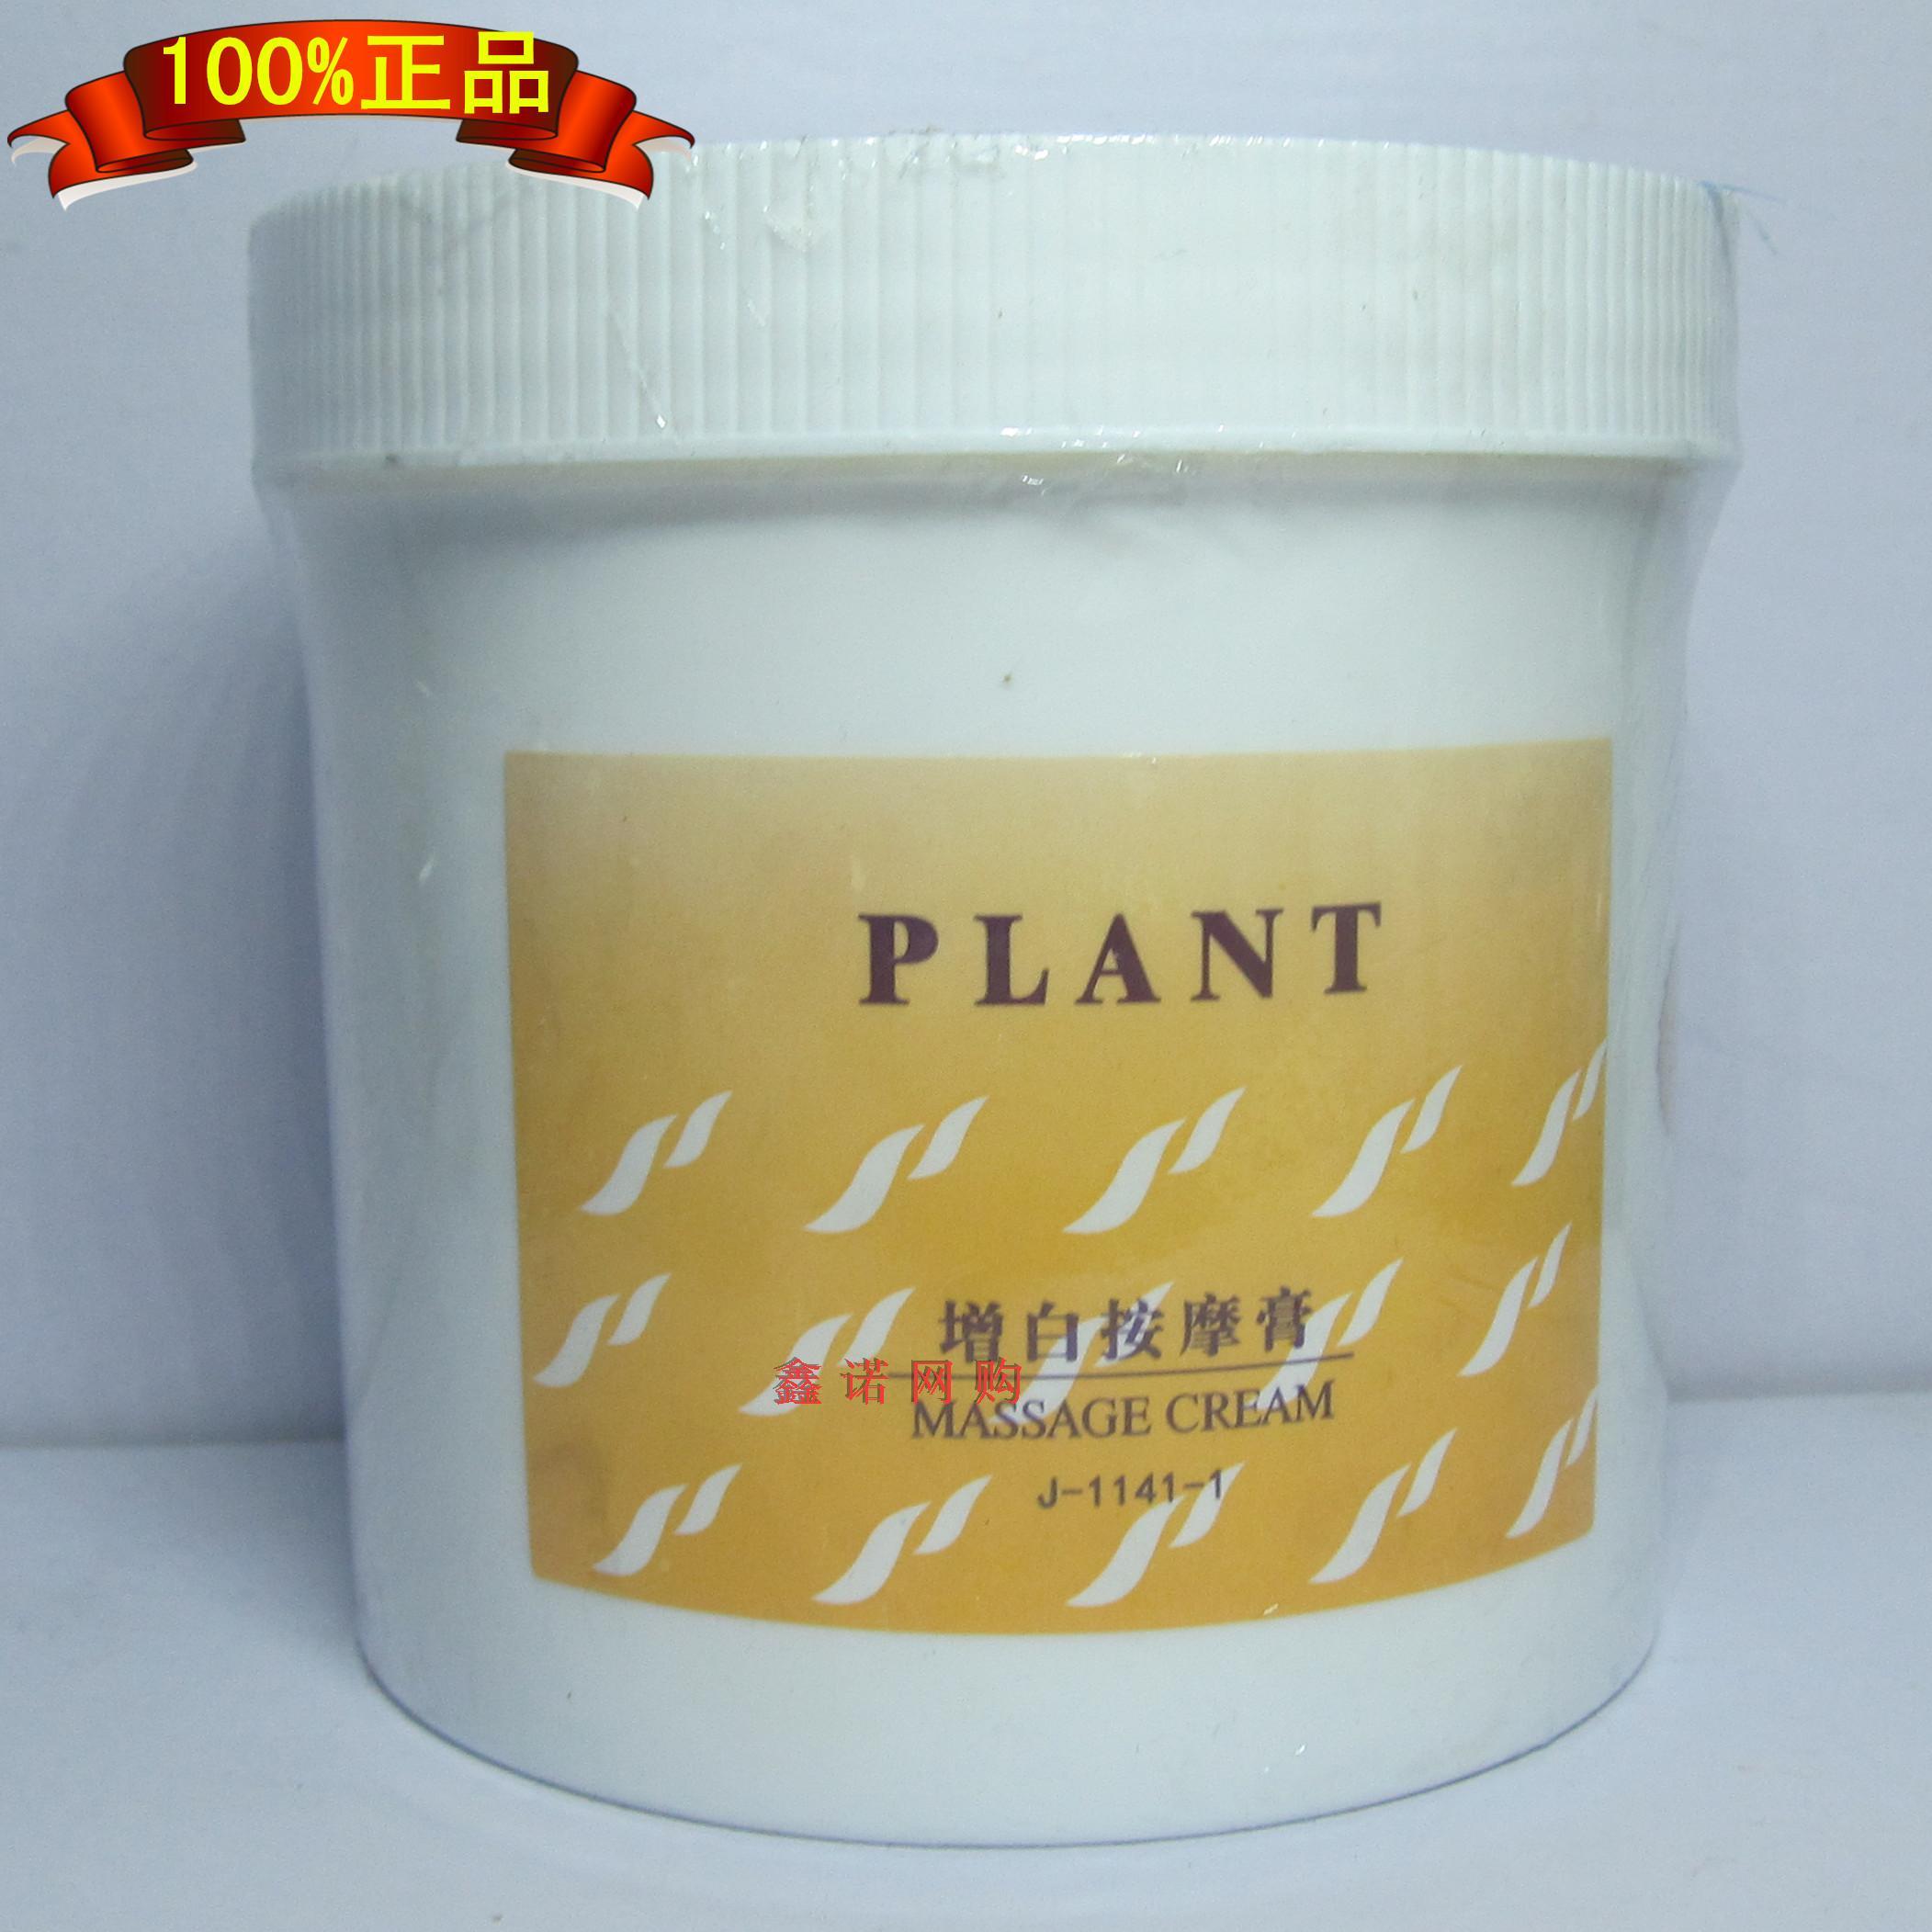 Hong Kong Huadu genuine skin lightening massage cream 480g moisturizing and moisturizing